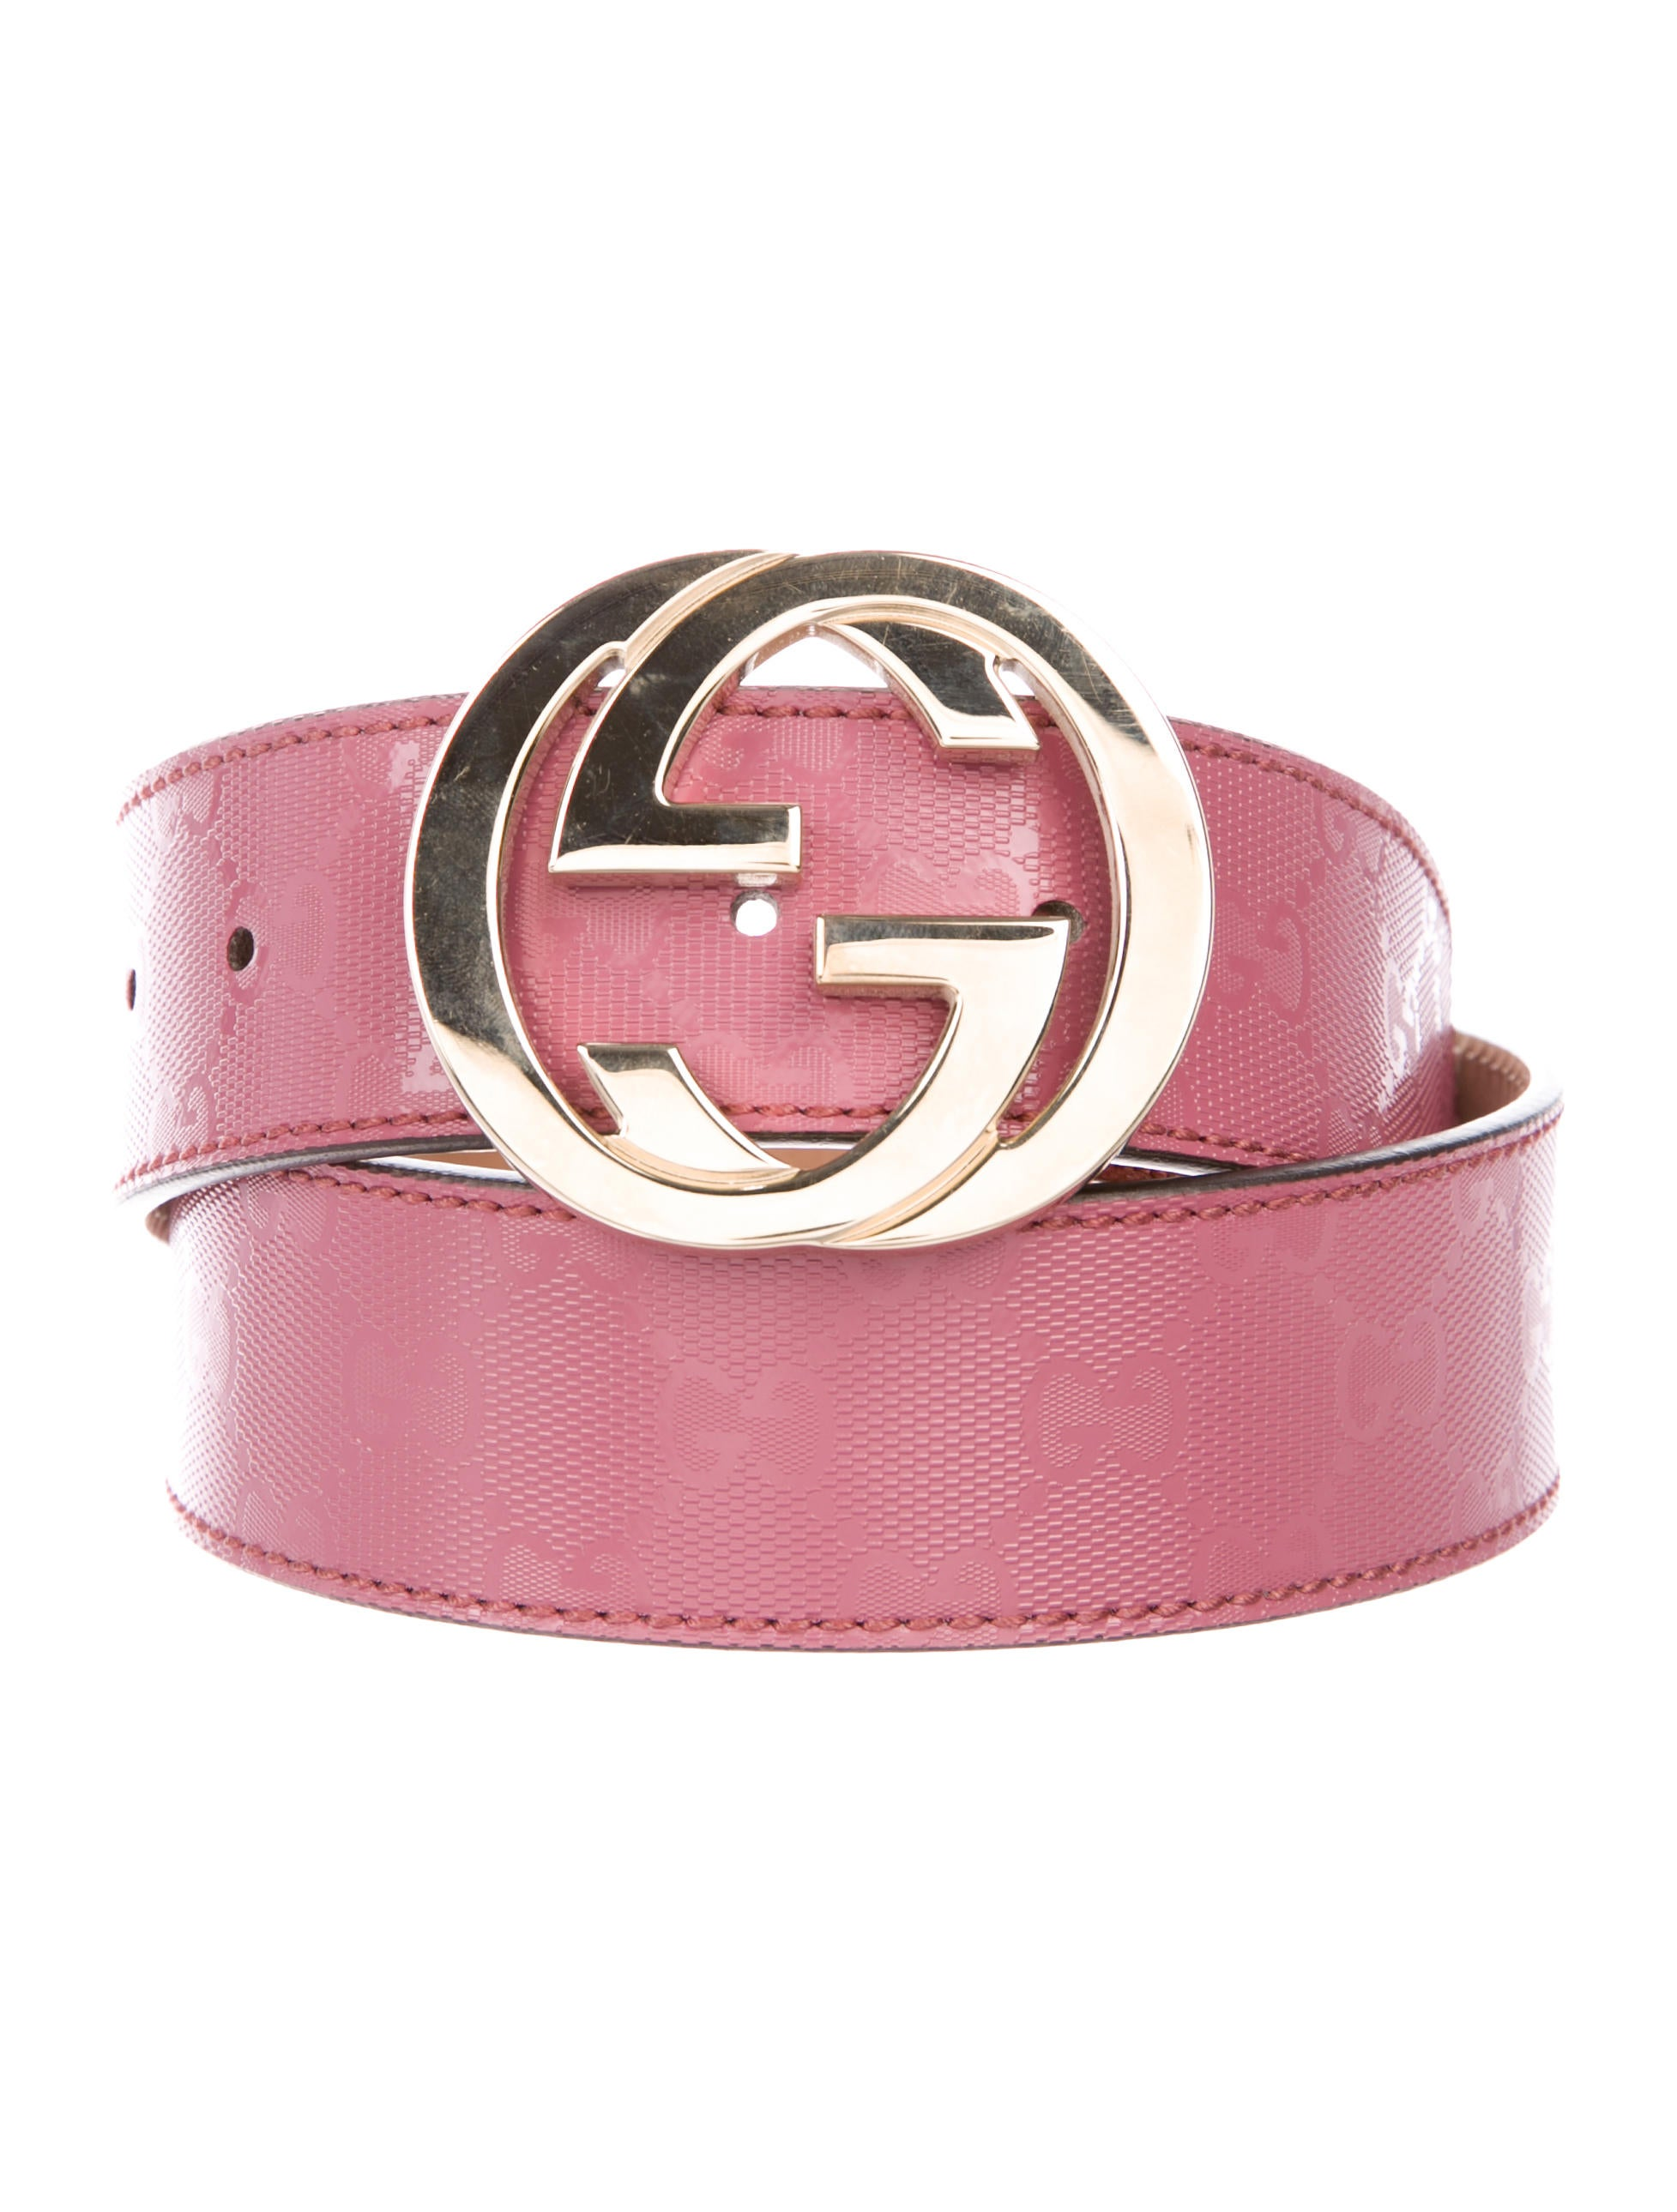 077ed73903c Gucci GG Imprime Belt - Accessories - GUC234810